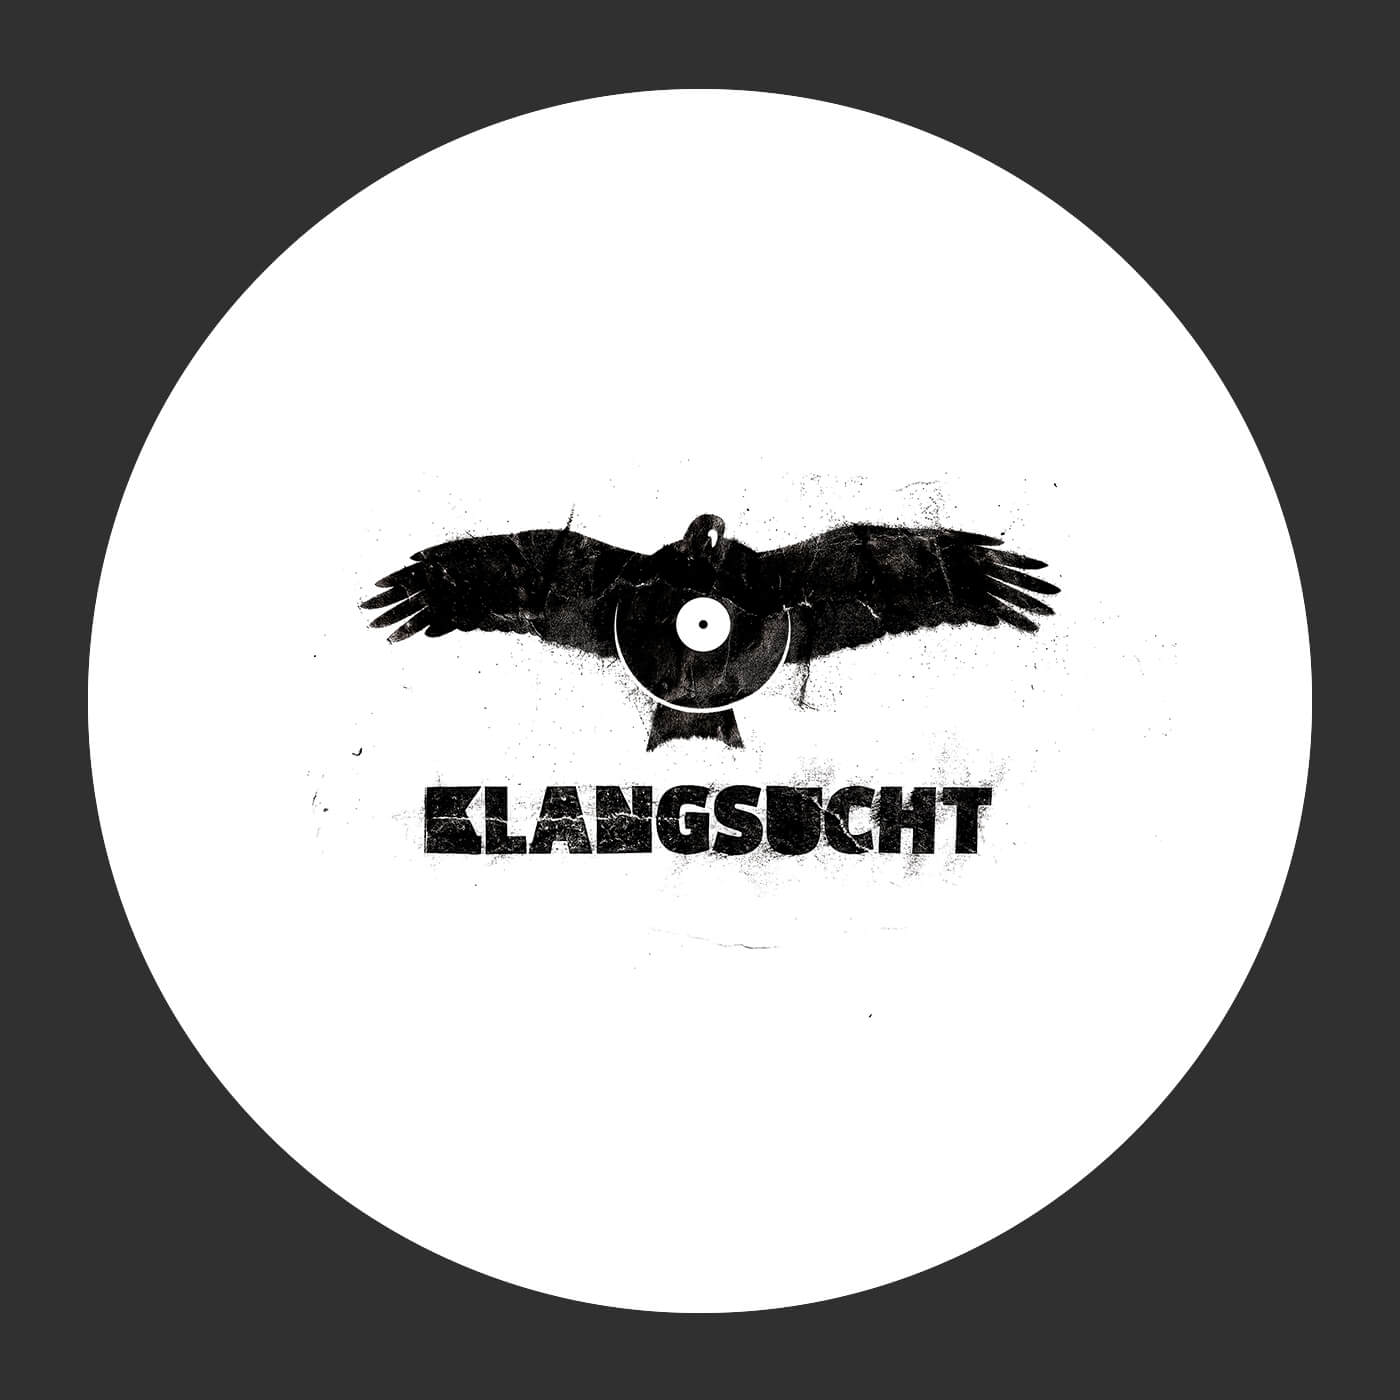 klangsucht_weiss